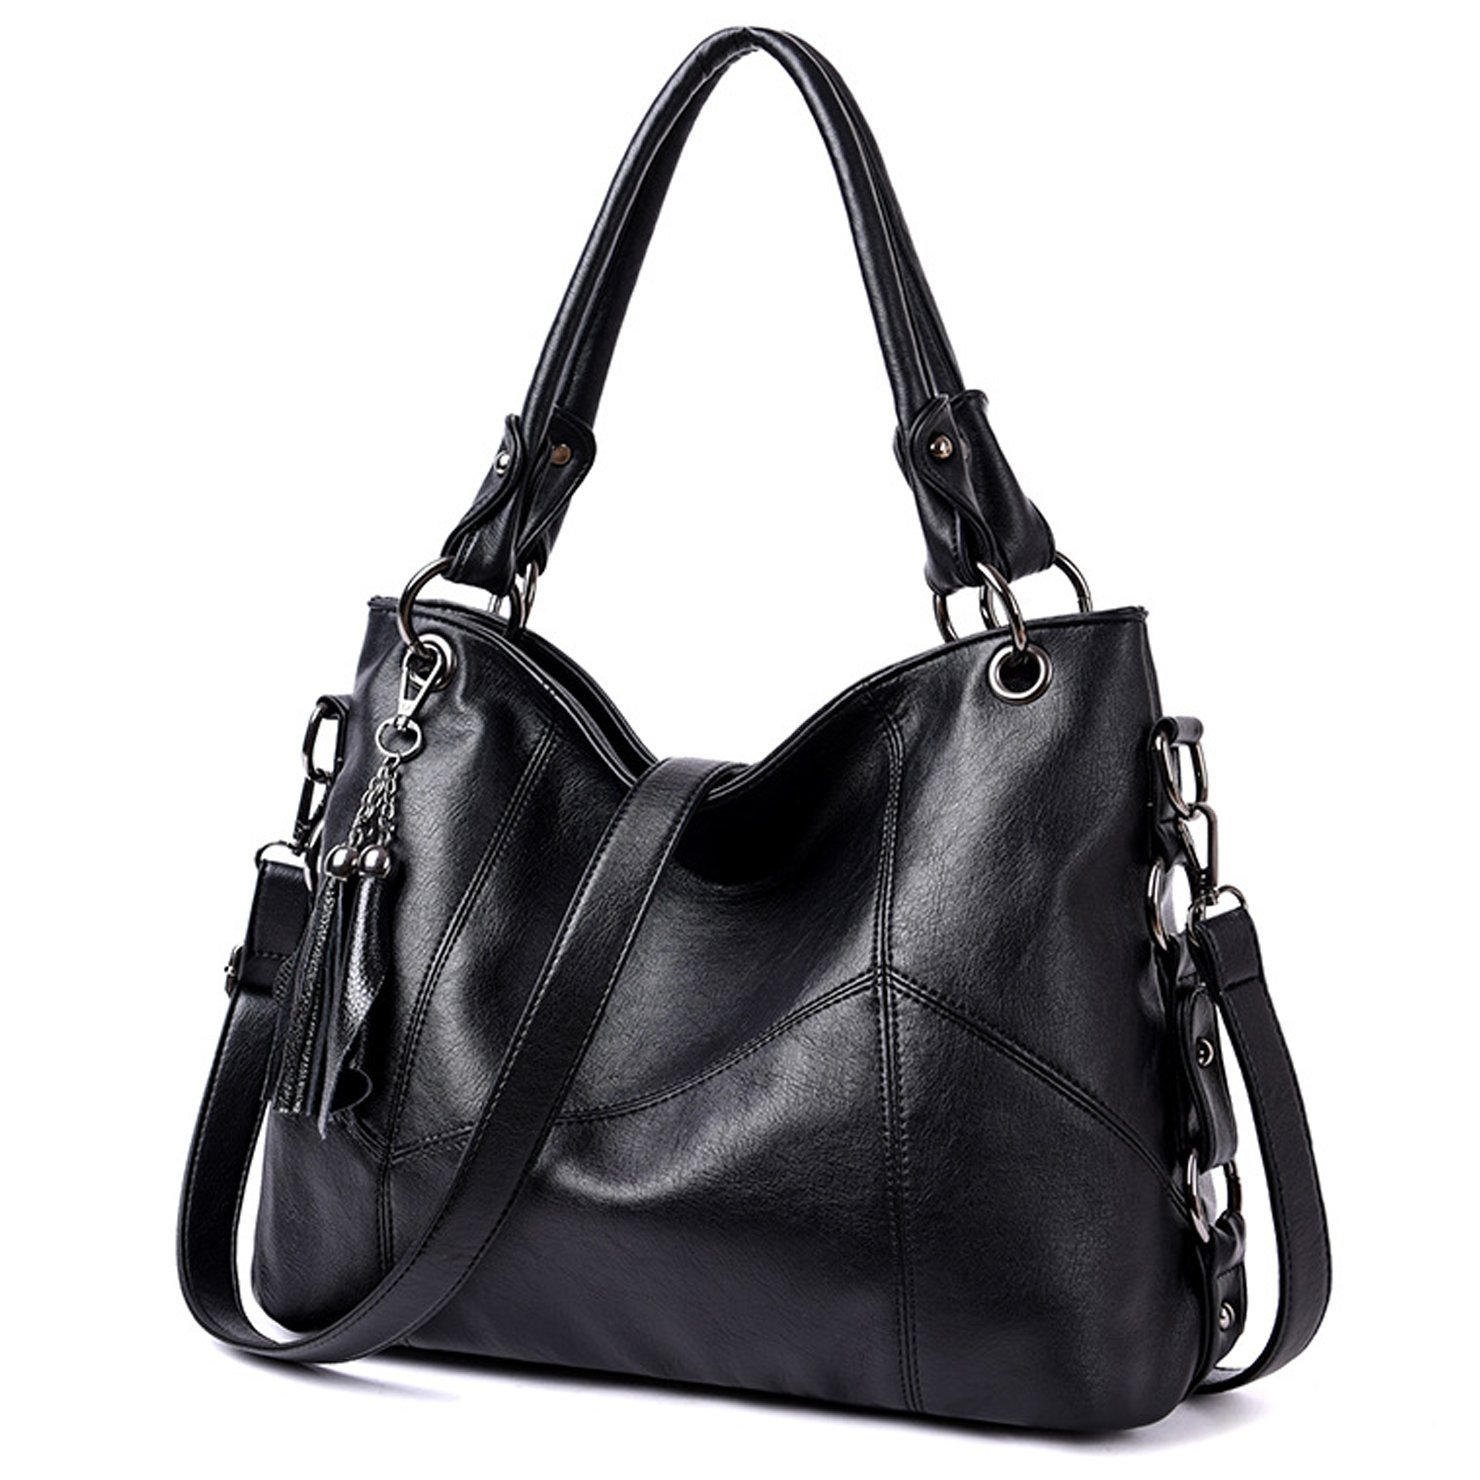 Lustear Soft Leather Handbag Hobo Style Purse Tote Shoulder Bag with Tassel For Women (Black)